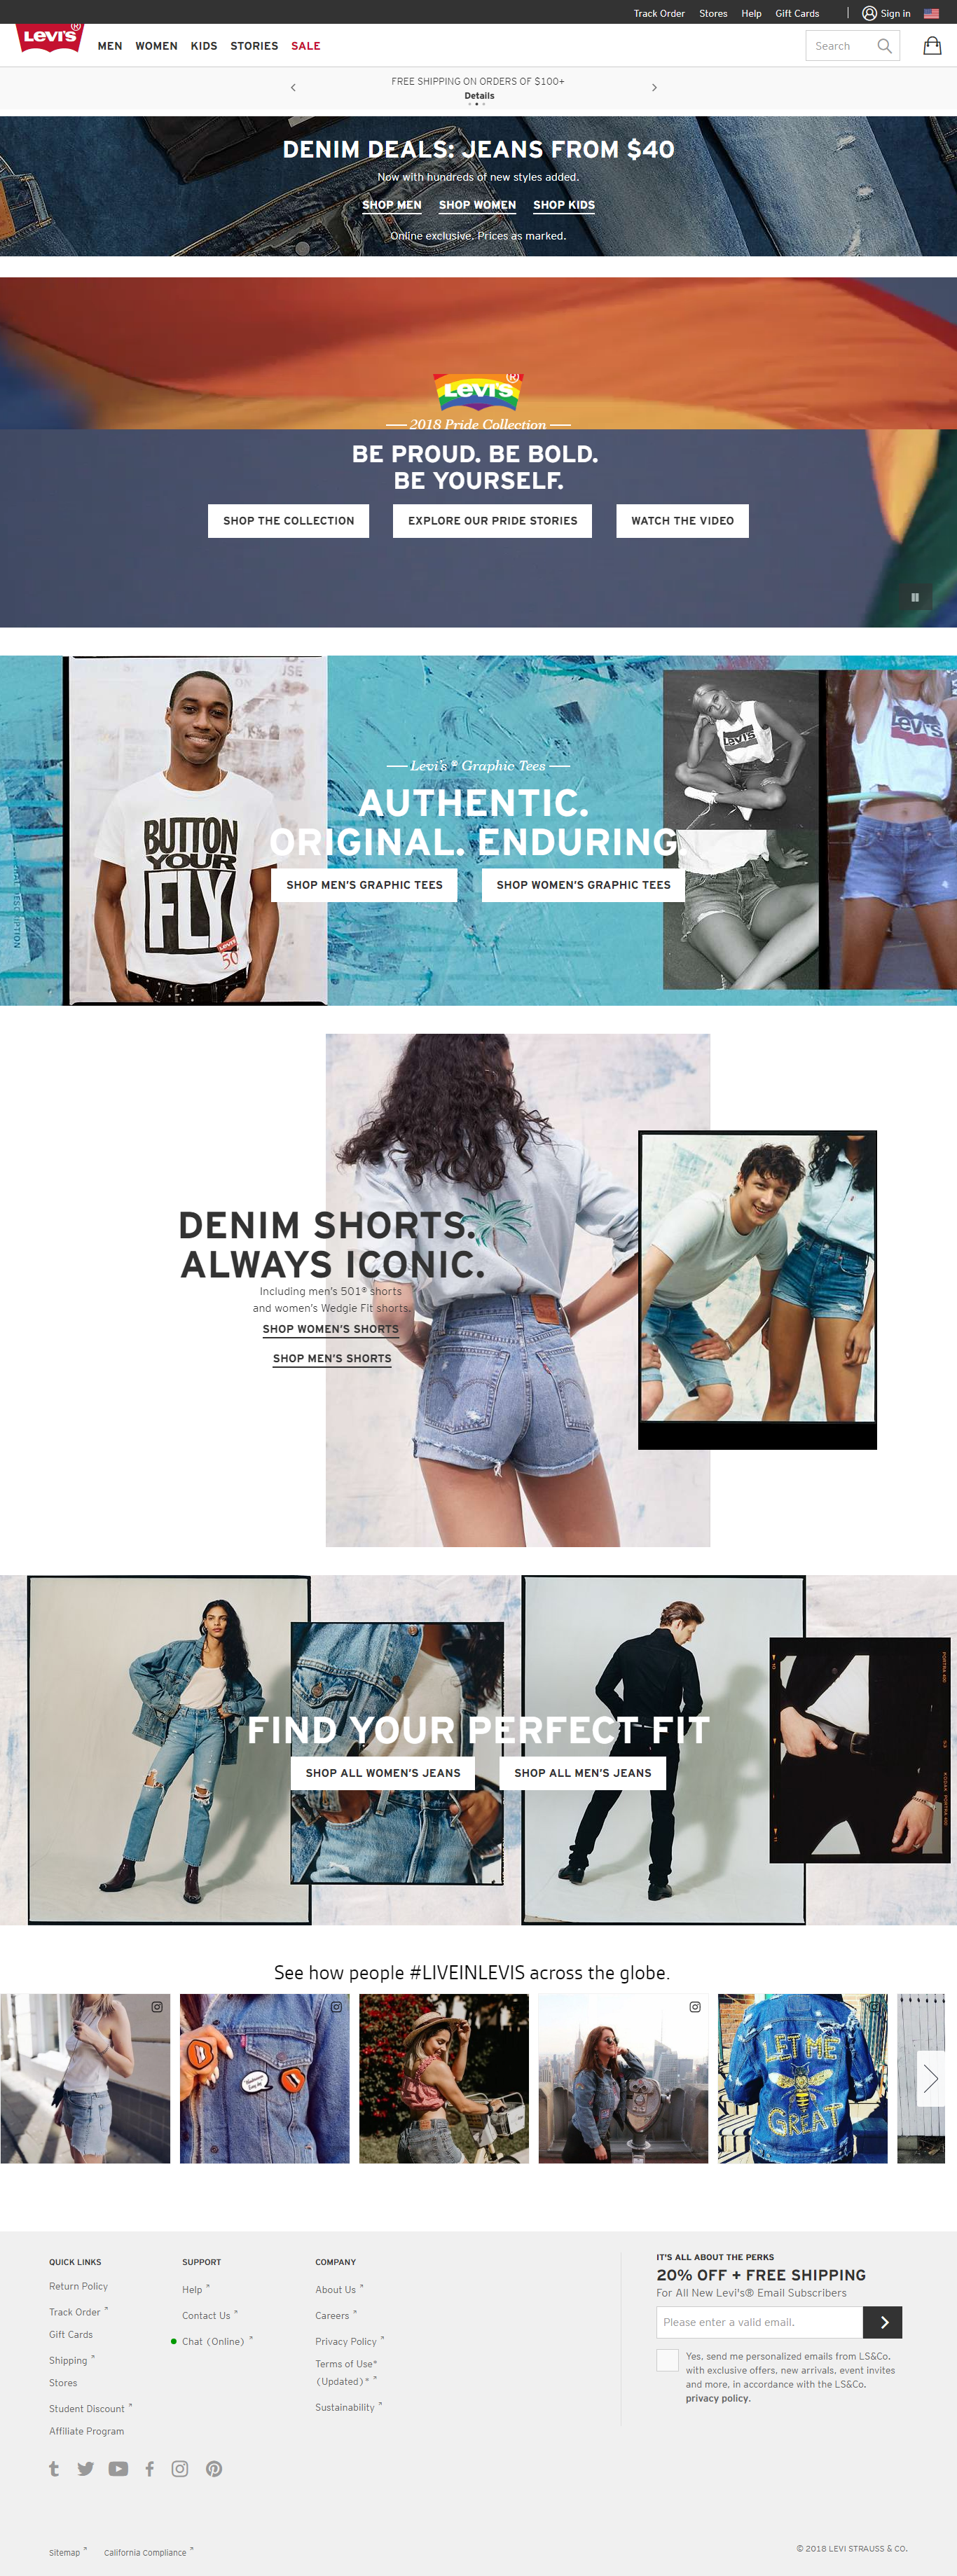 Levi's US website  Page captured 06/09/2018